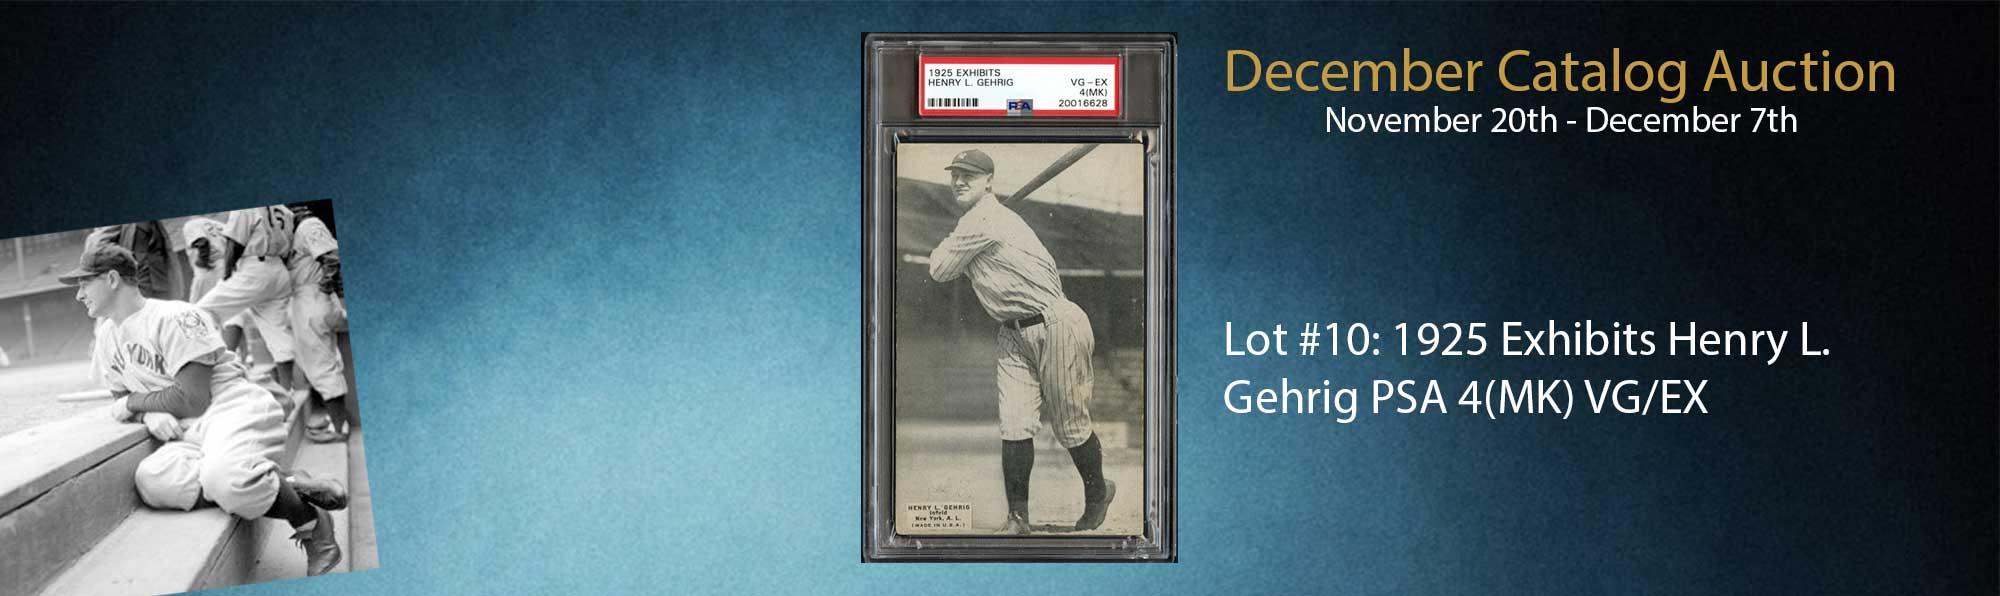 1925 Exhibits Lou Gehrig PSA 4